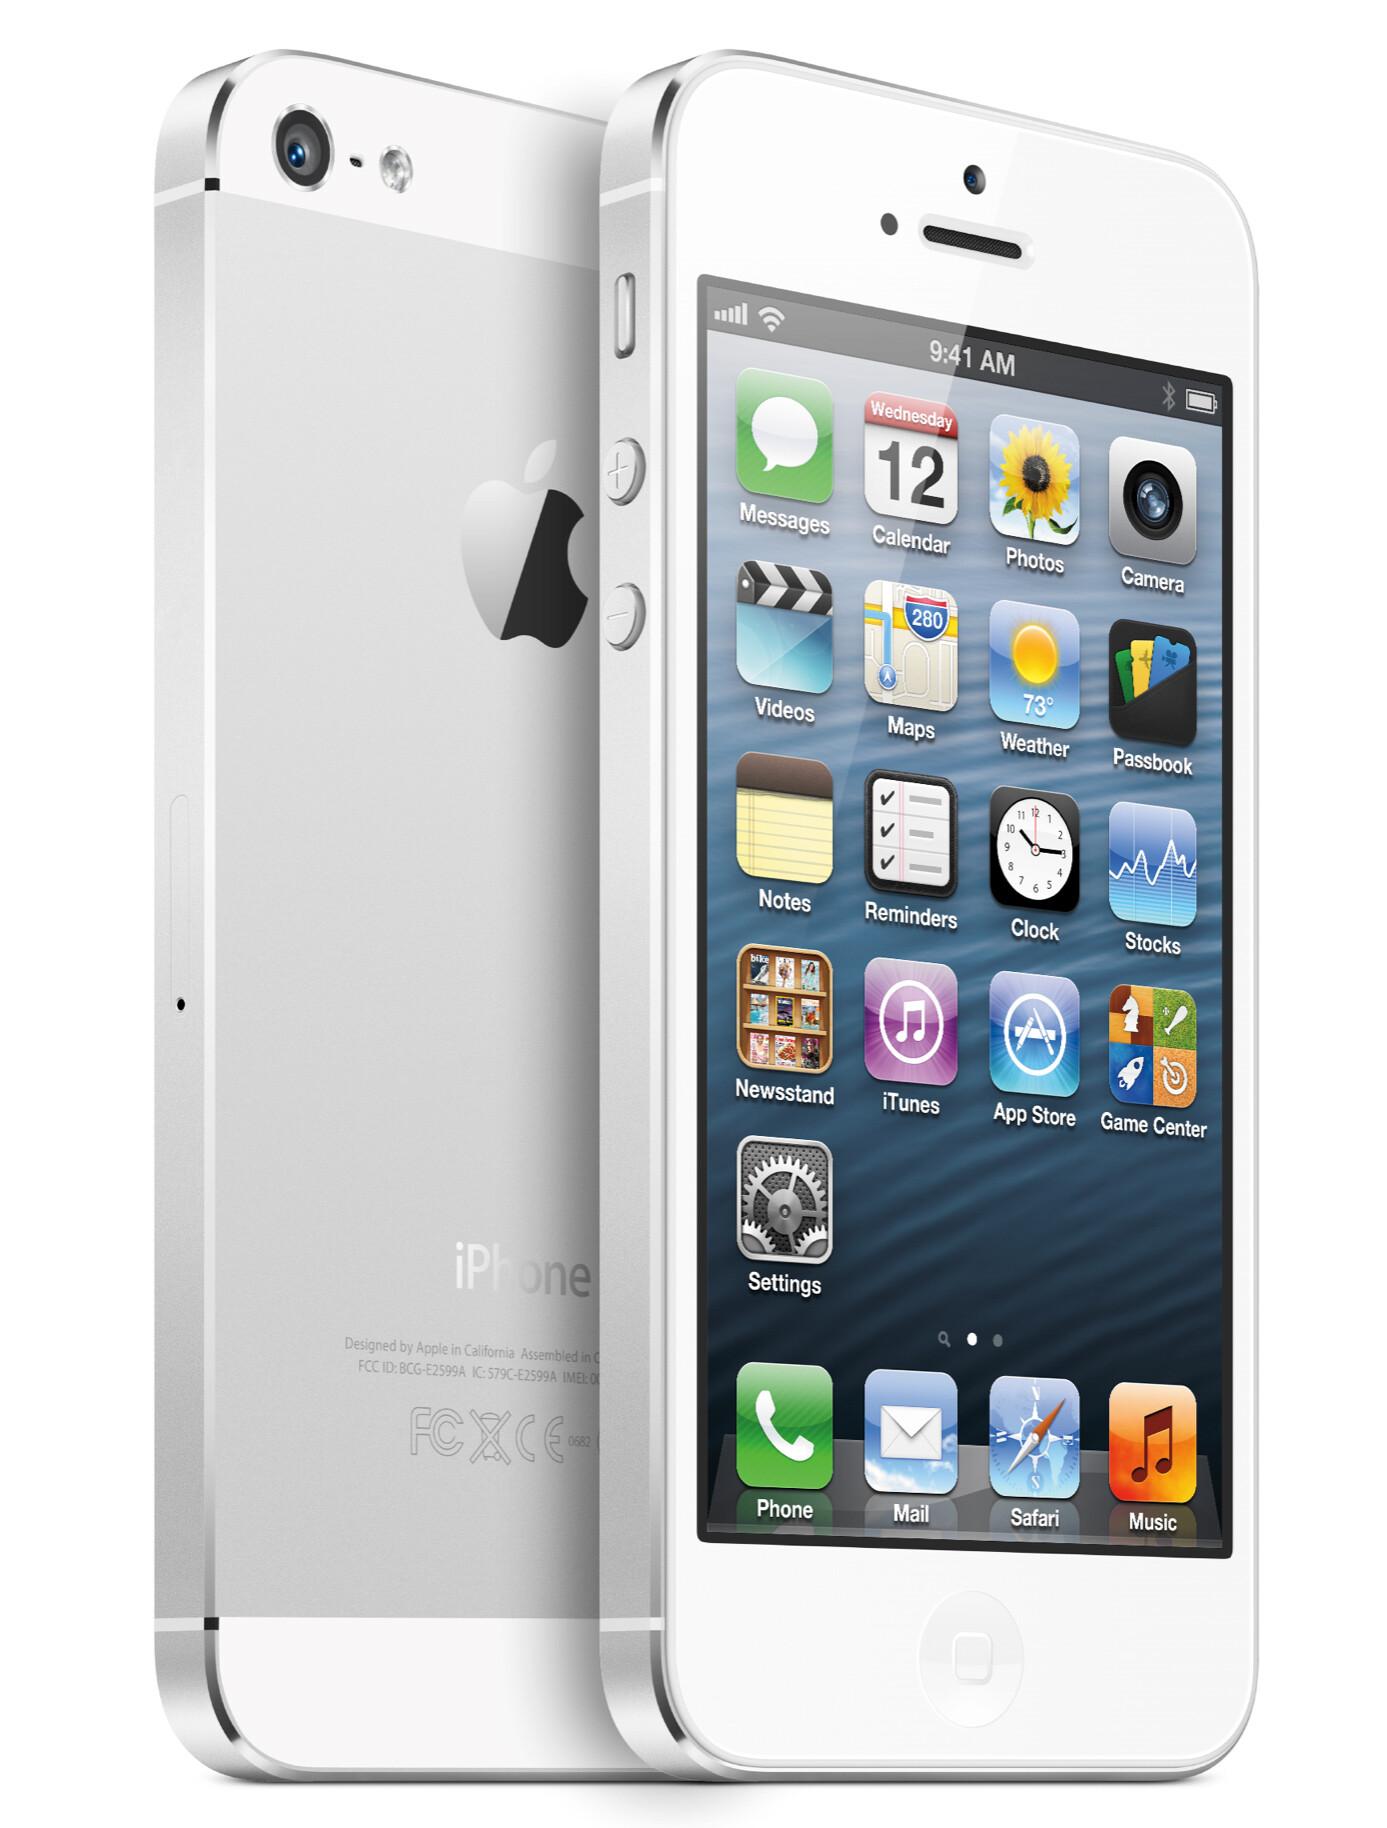 Apple Iphone Ad